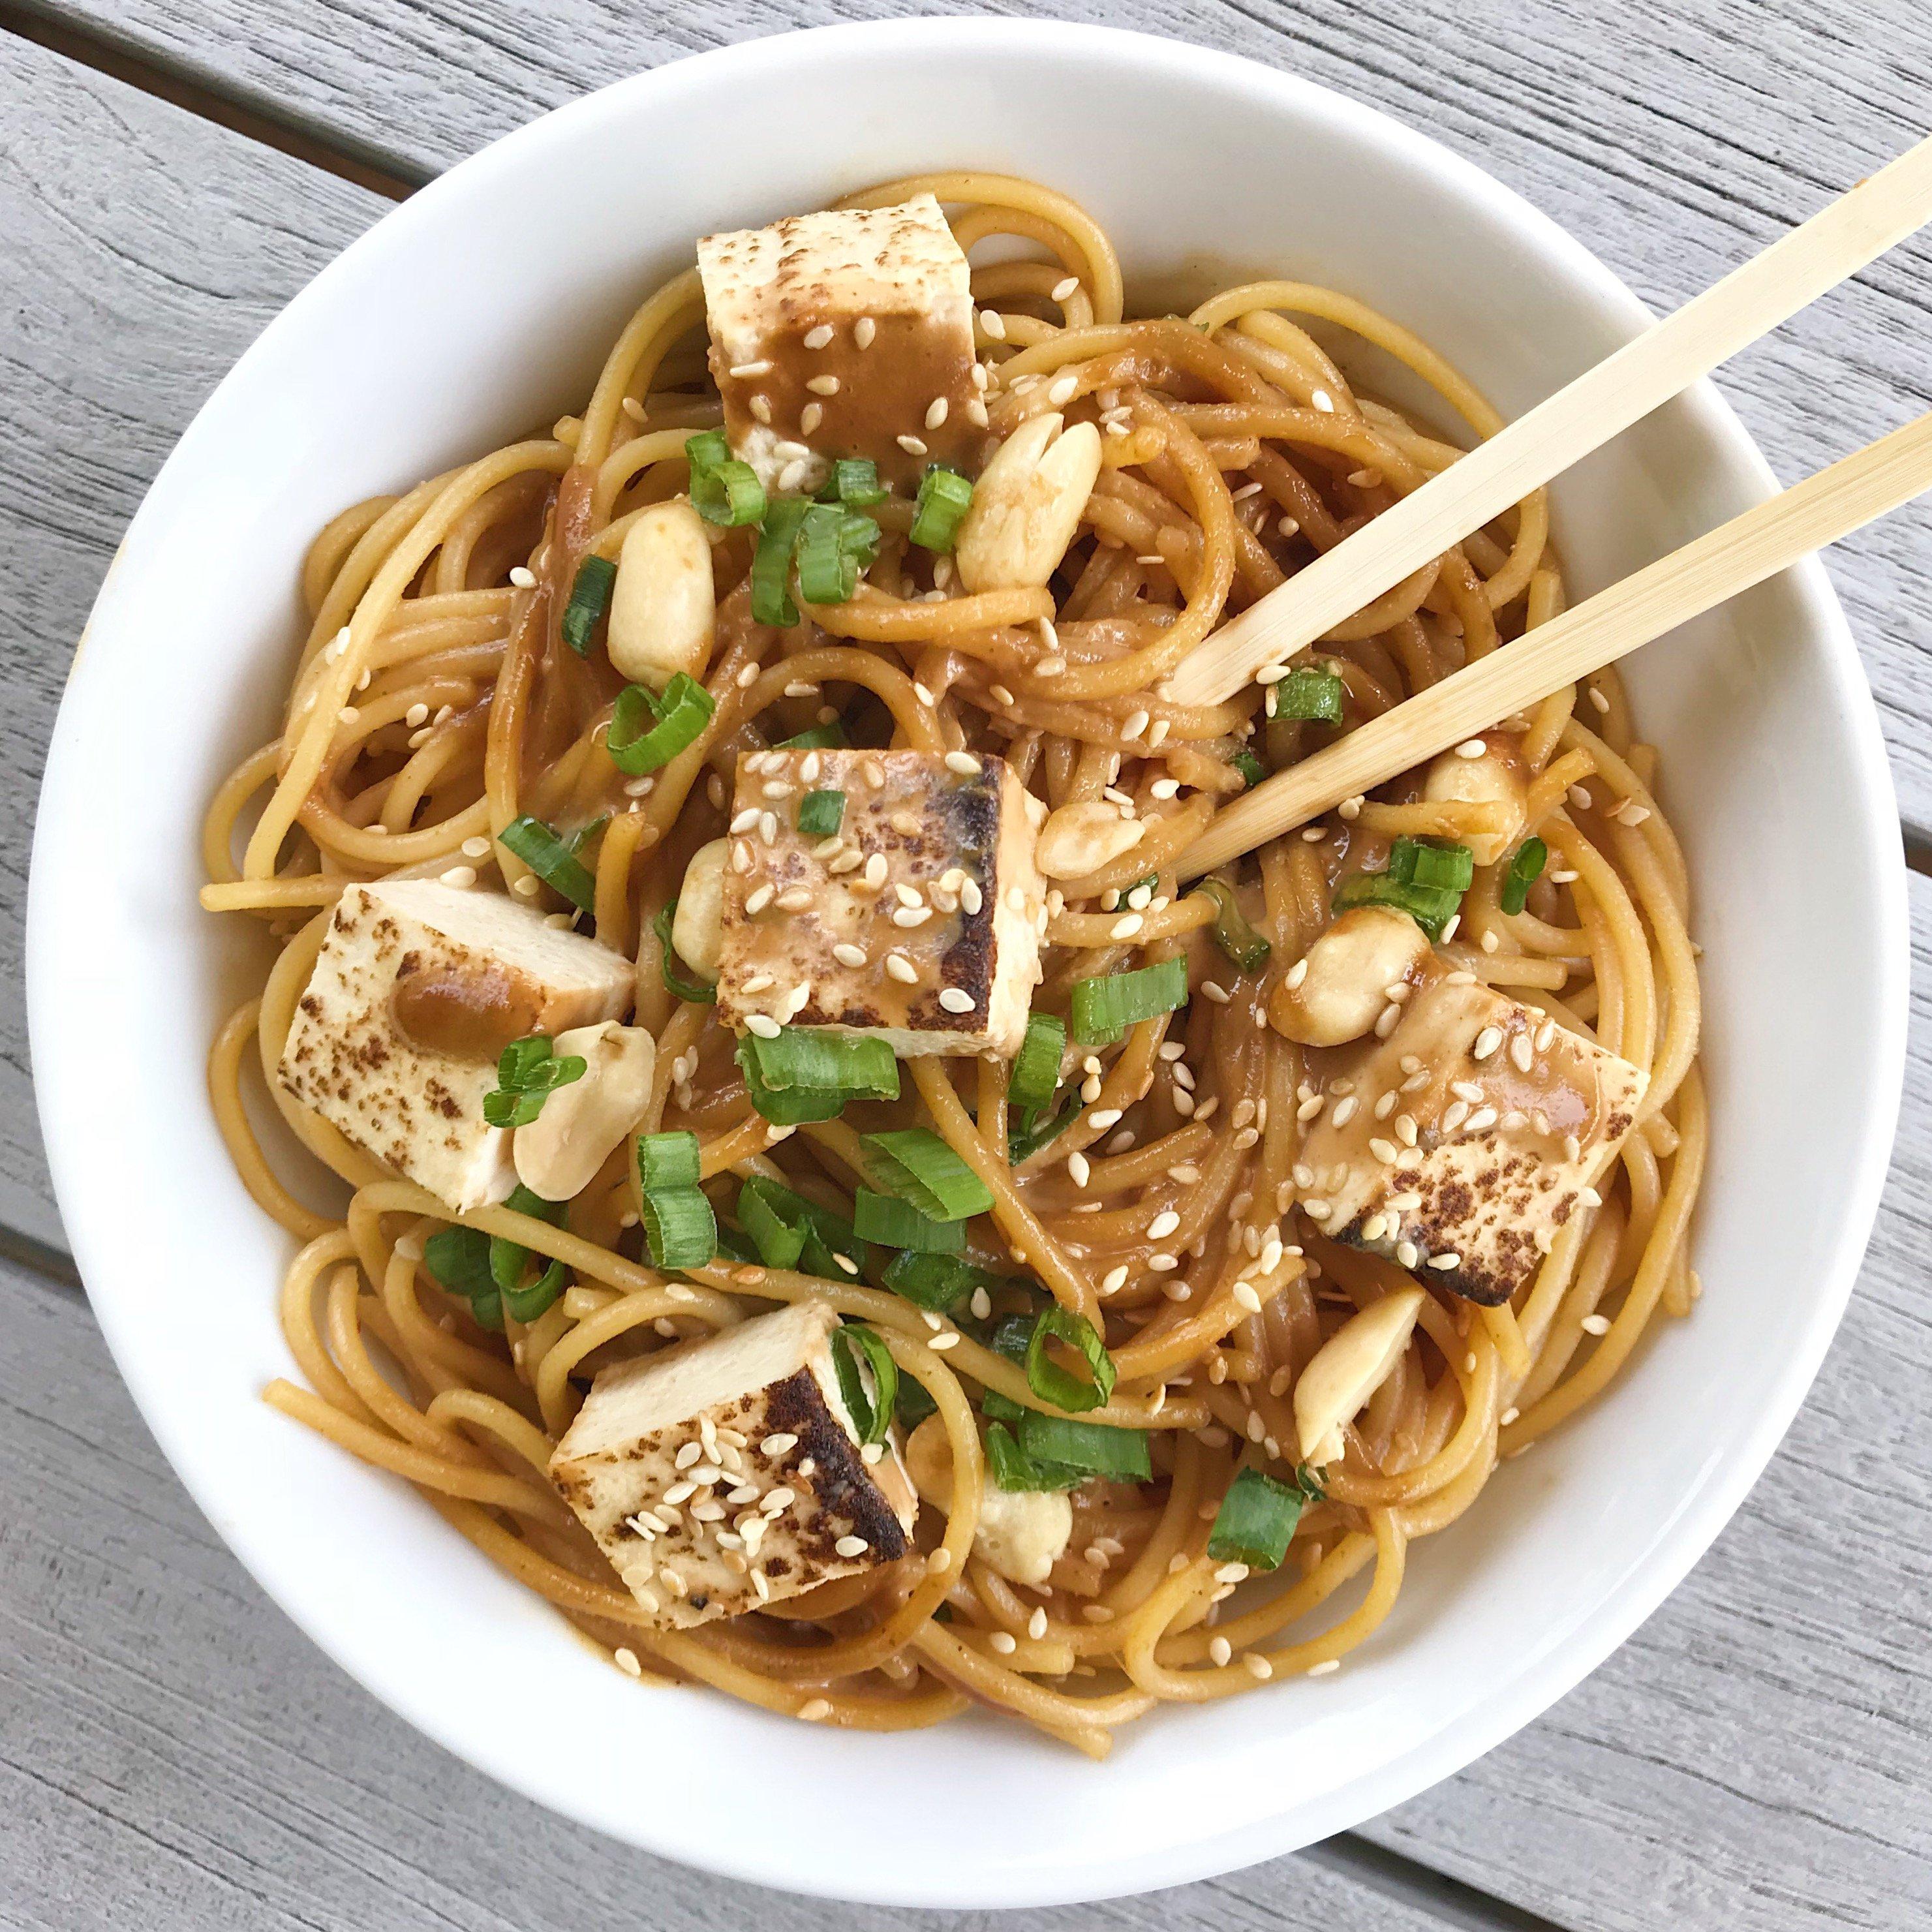 takeout style Sesame Noodles gluten free #glutenfreerecipes www.healthygffamily.com